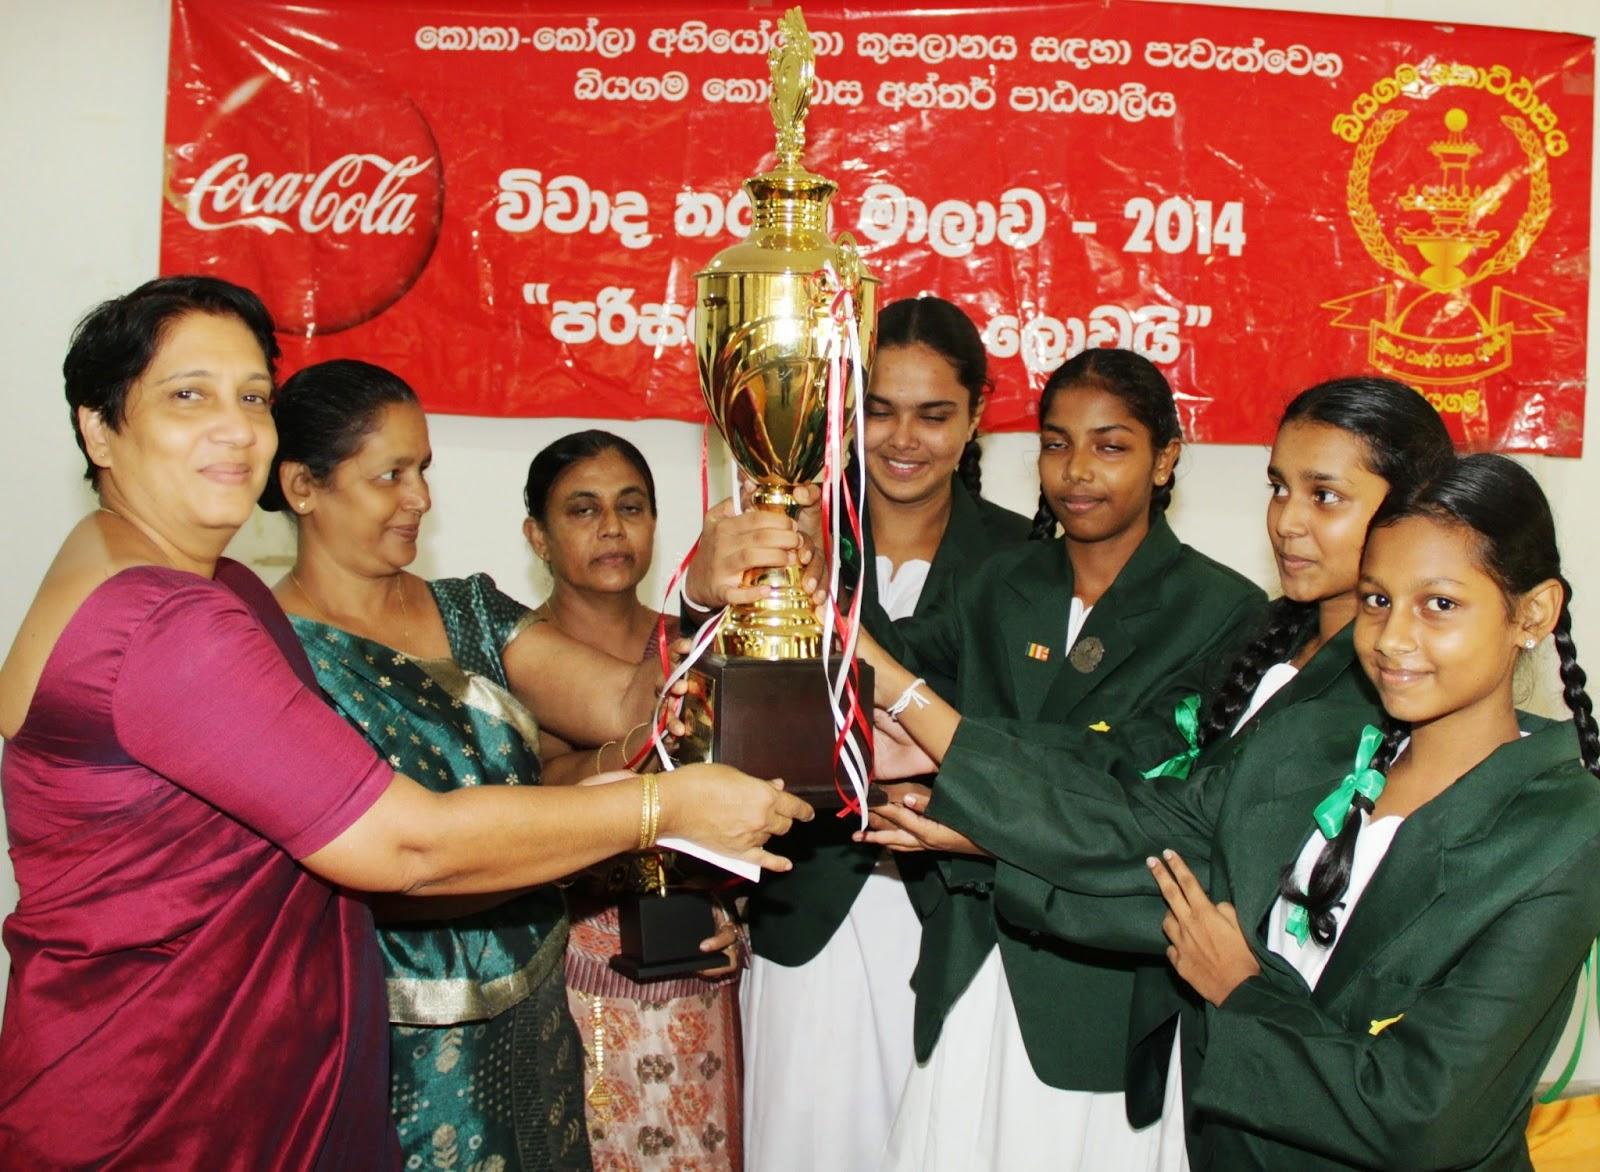 Nilanthi Jayatillake, Country HR Manager, Coca-Cola Beverages Sri Lanka Ltd presenting the trophy to the students of the winning team, Visaka Balika Vidyalaya.